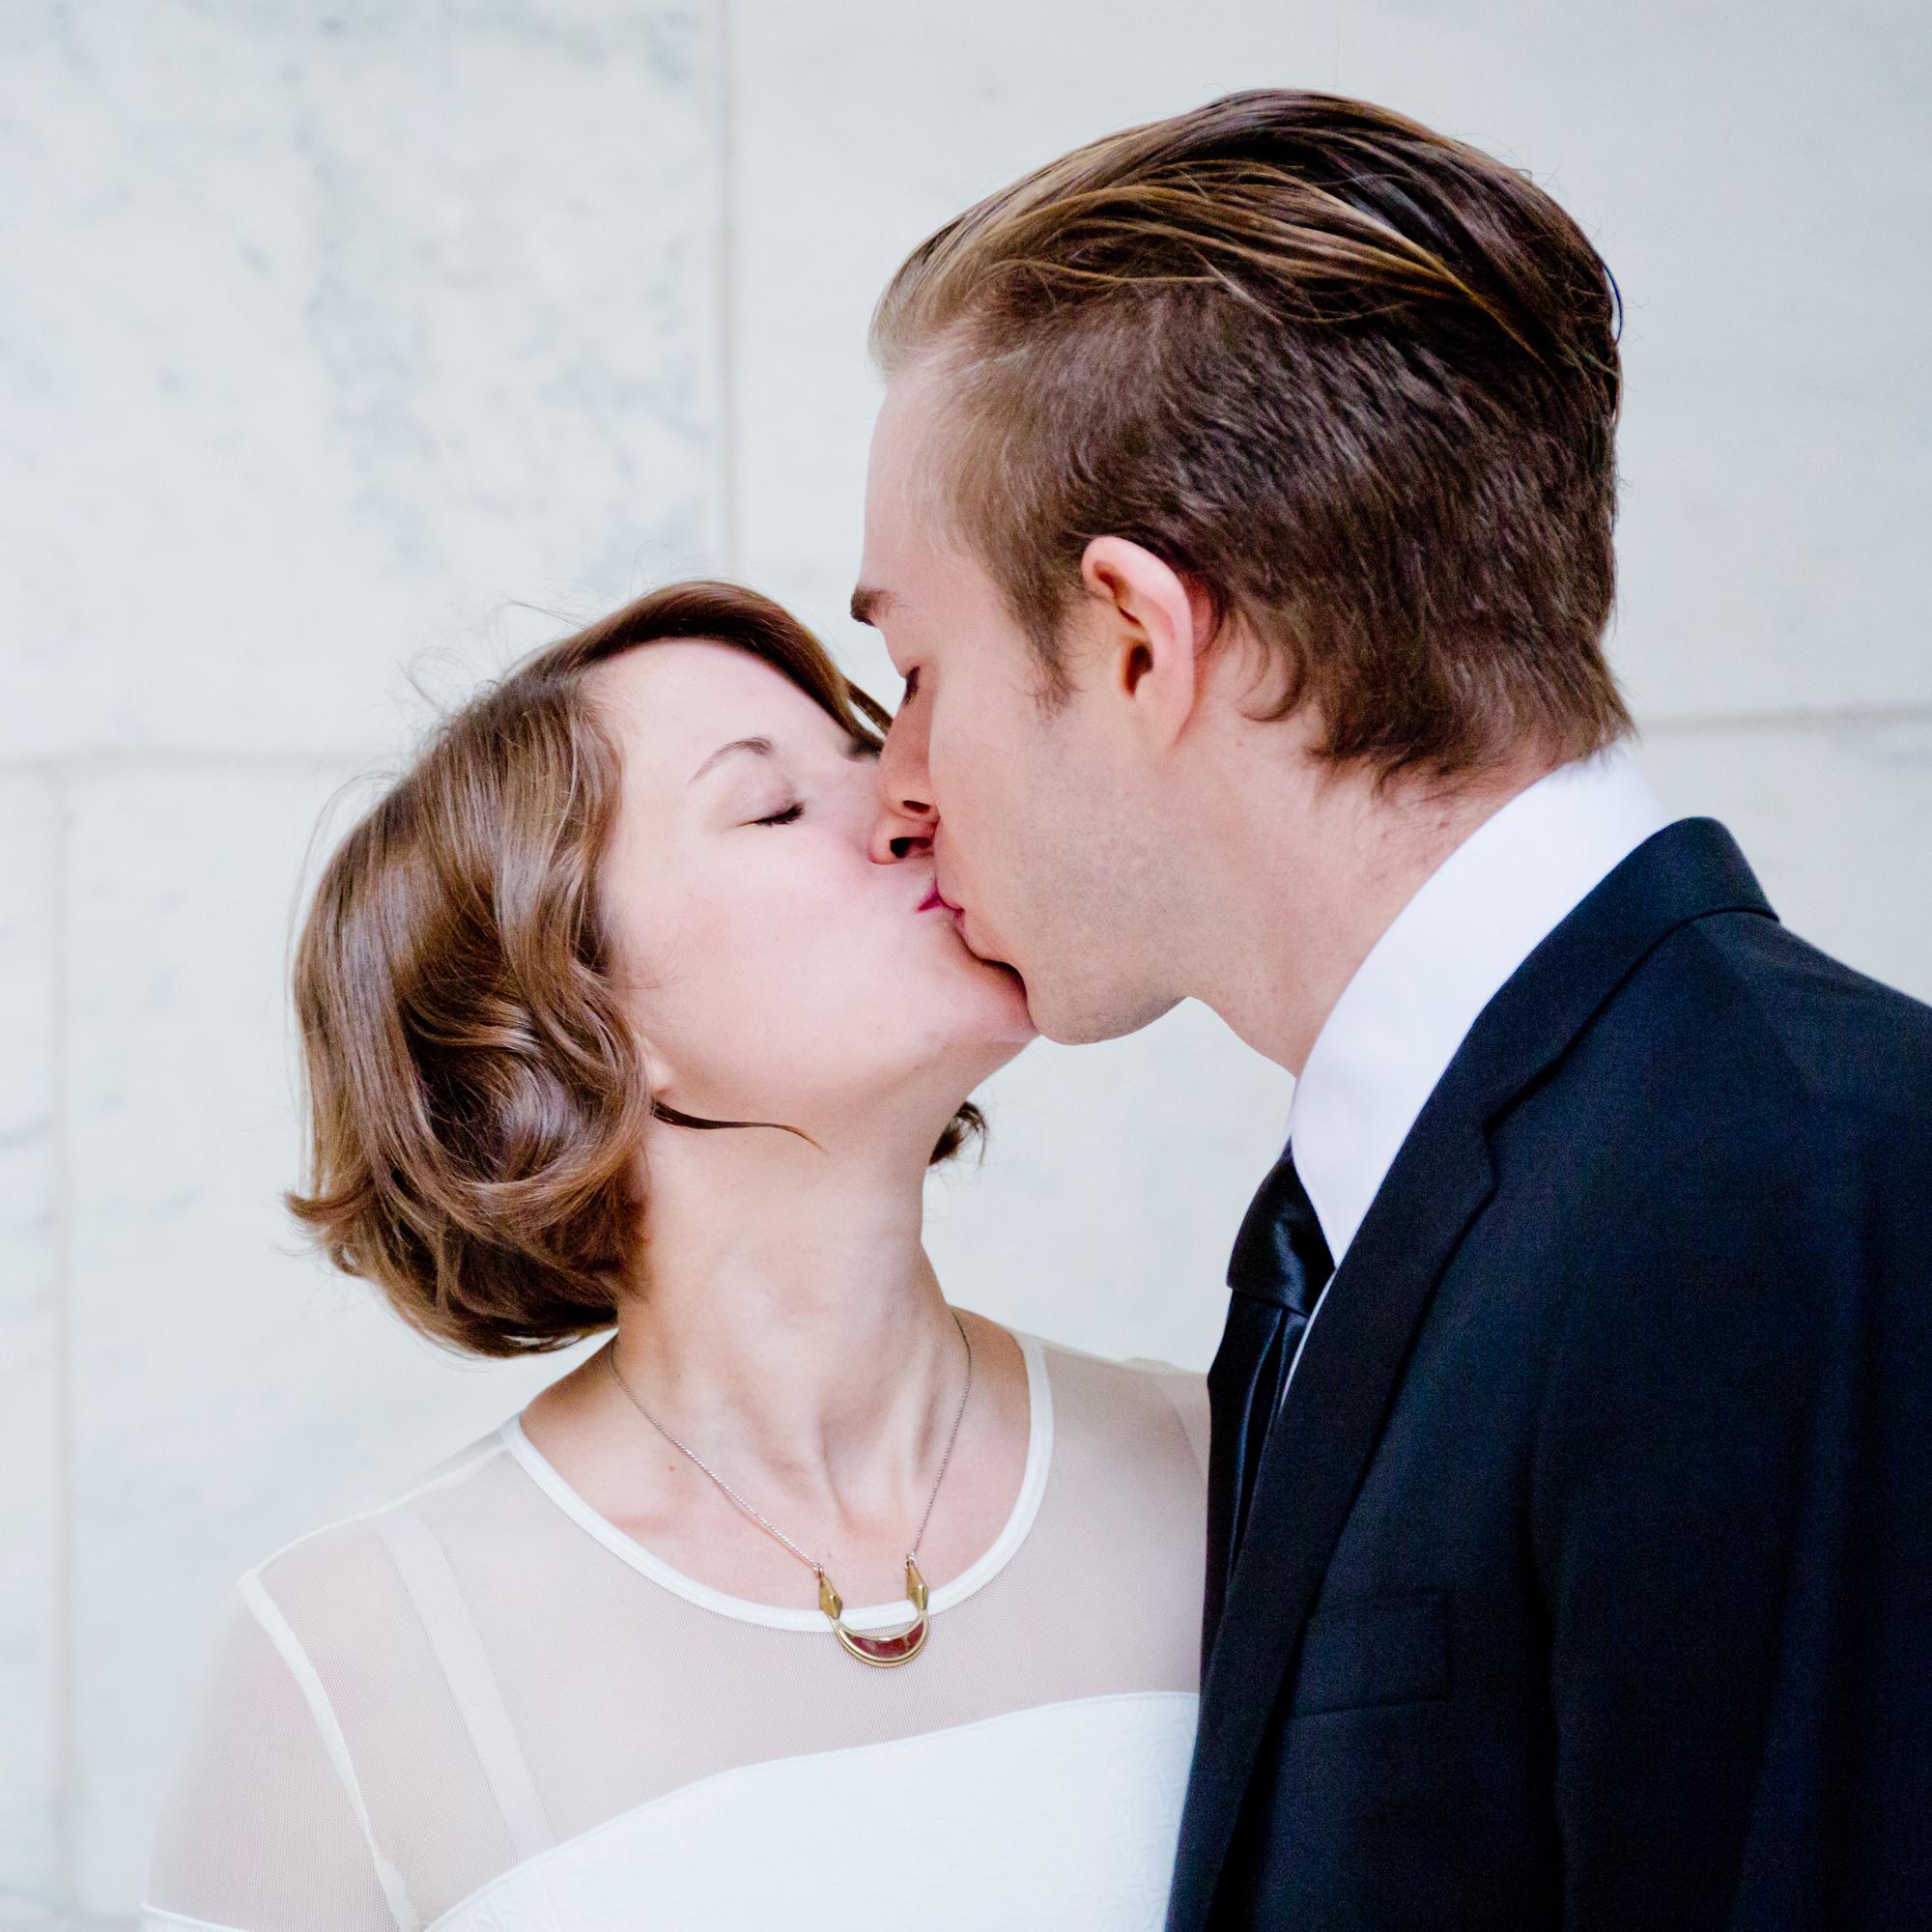 119_CarlyGaebe_SteadfastStudio_WeddingPhotography_NewYorkCity_Manhattan_BryantPark_PublicLibrary_Bride_Groom_Architecture.jpg